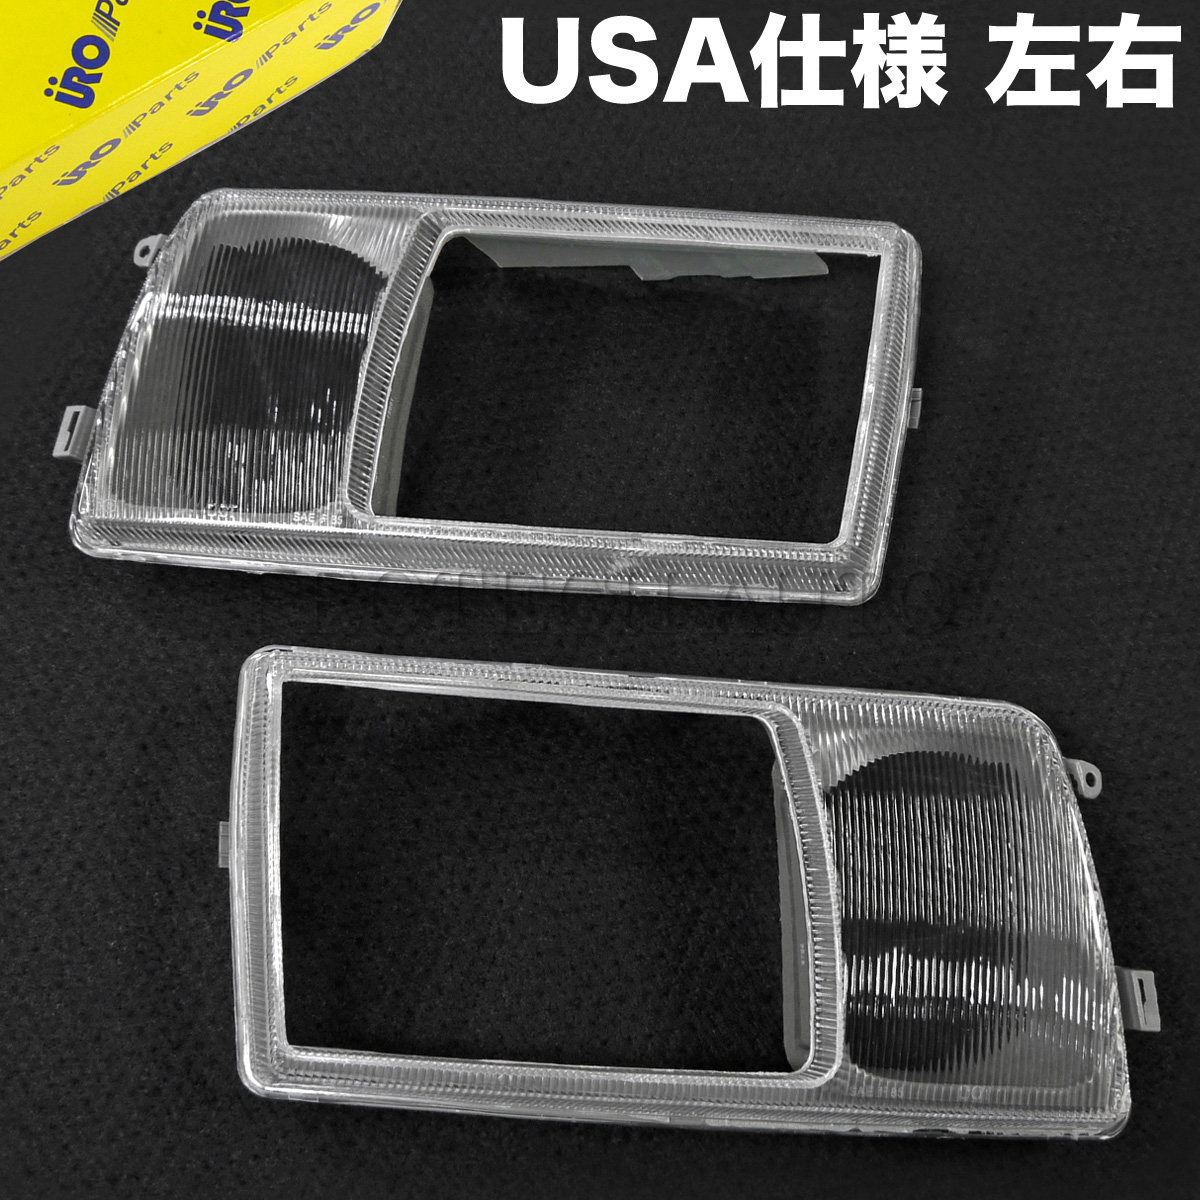 URO製 ベンツ W126 ヘッドライトレンズ/ヘッドライトカバー 左右セット USA仕様 0008260759 0008260859 set152 300SE 350SD 300SEL 420SEL 560SEL 300SDL 350SDL【あす楽対応】